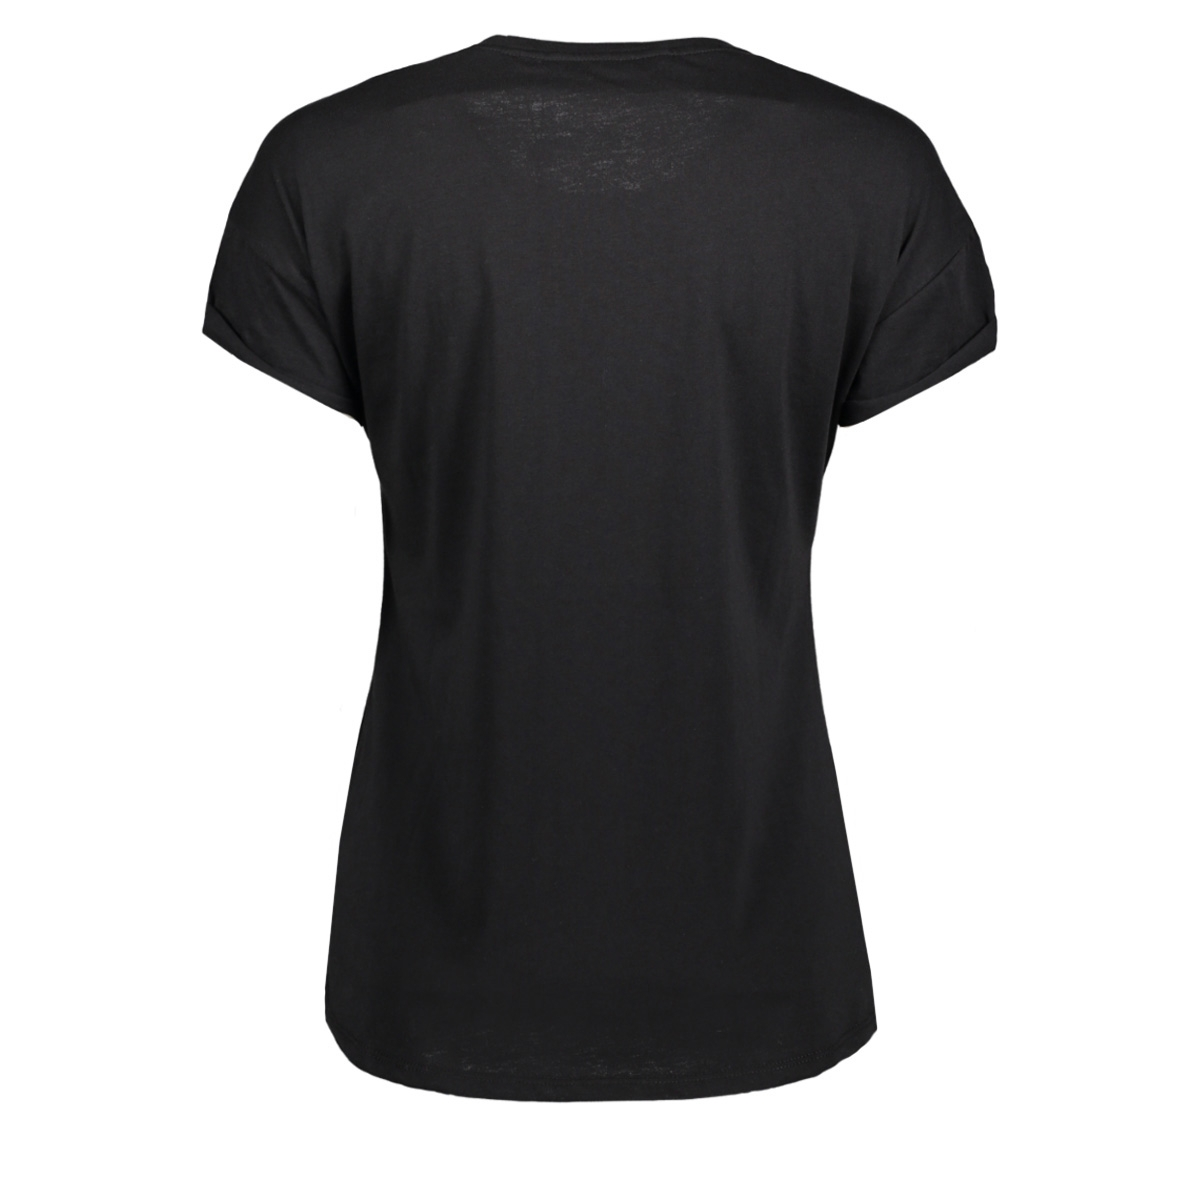 j70202 garcia t-shirt 60 black